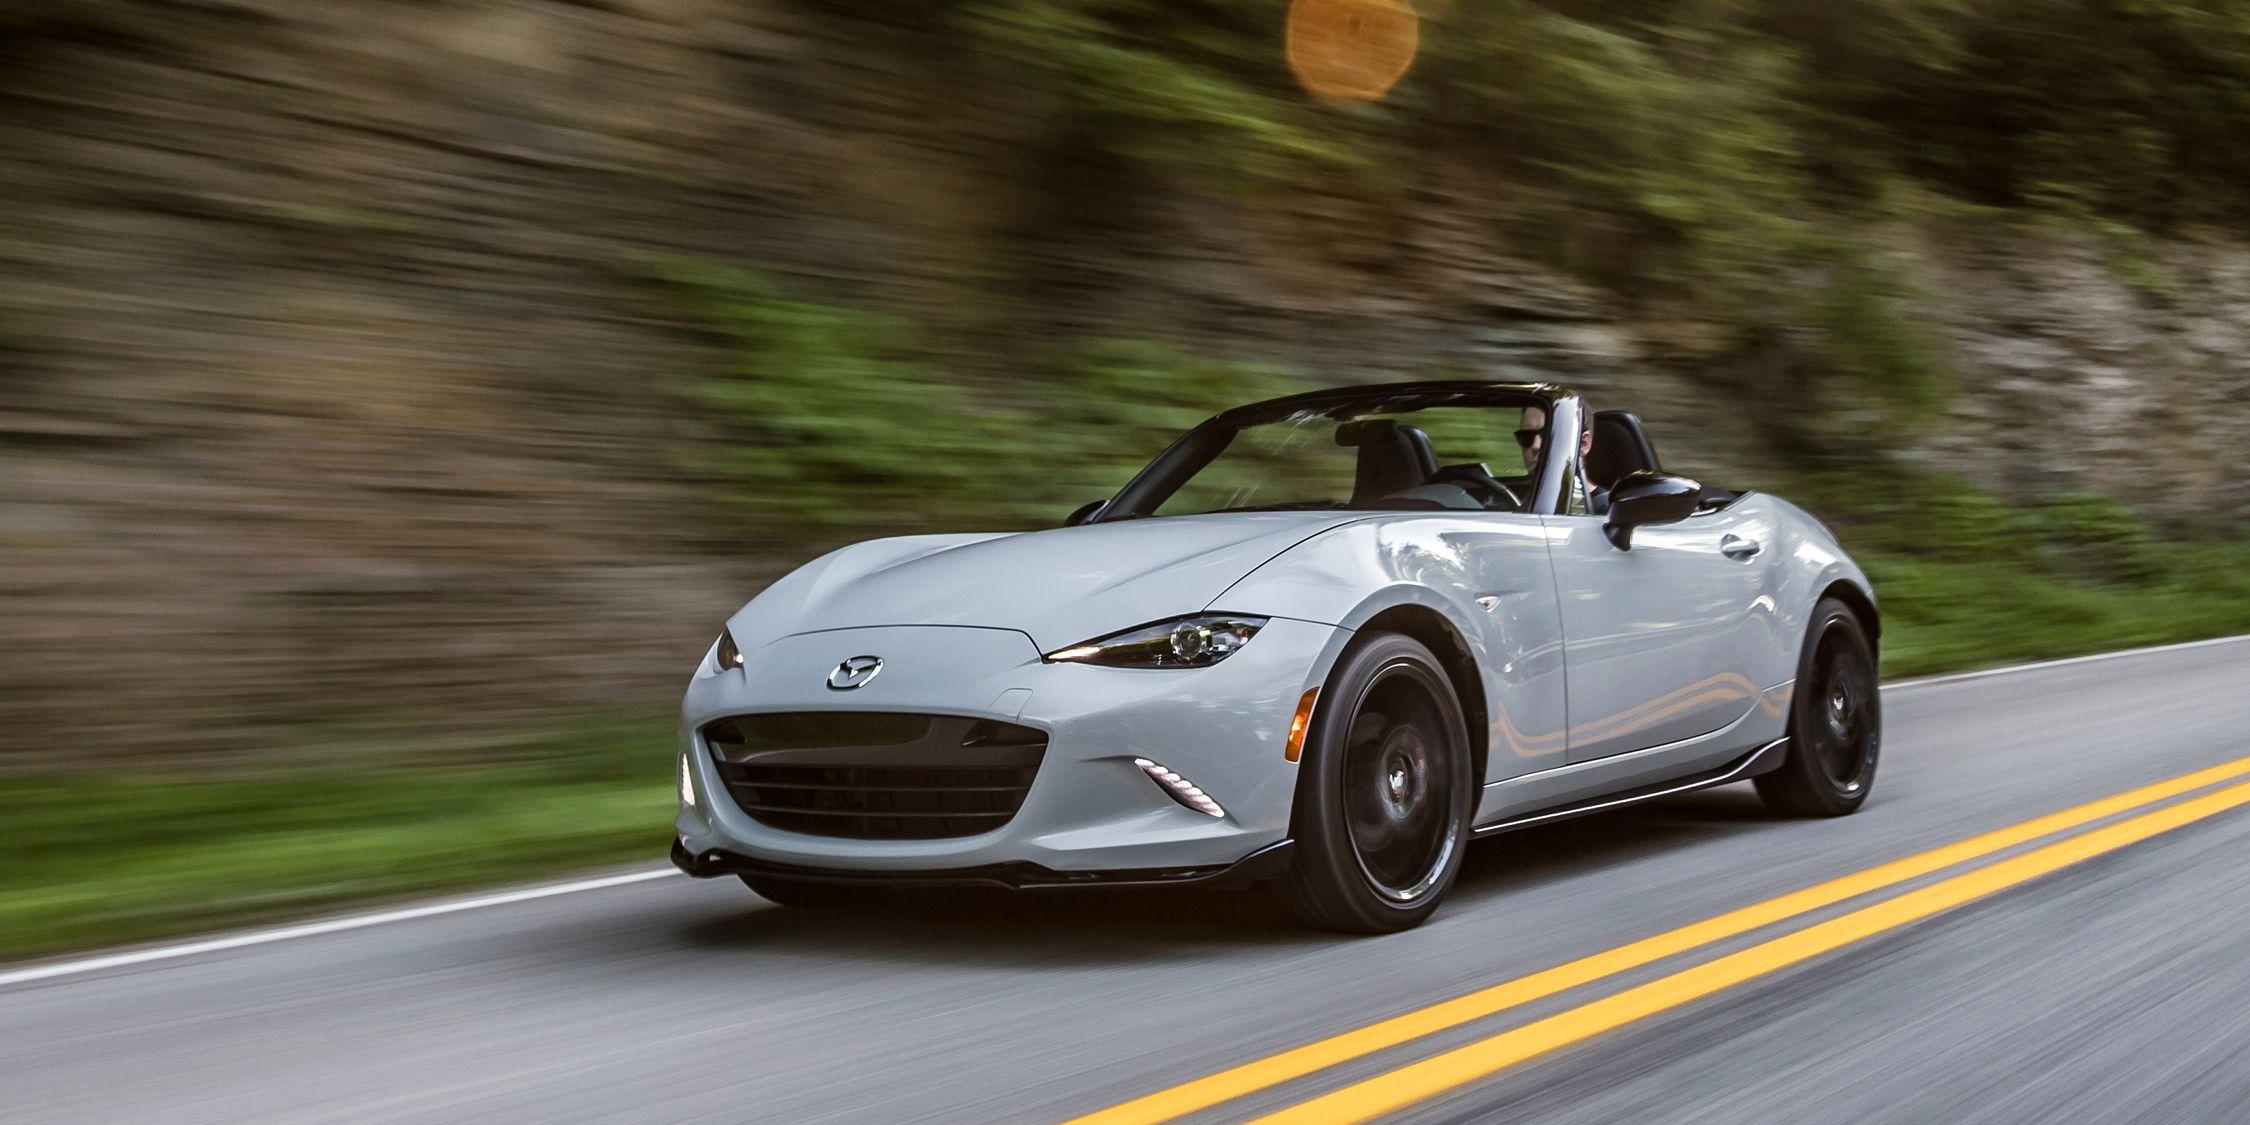 2016 Mazda Mx 5 Miata Long Term Test Review Car And Driver